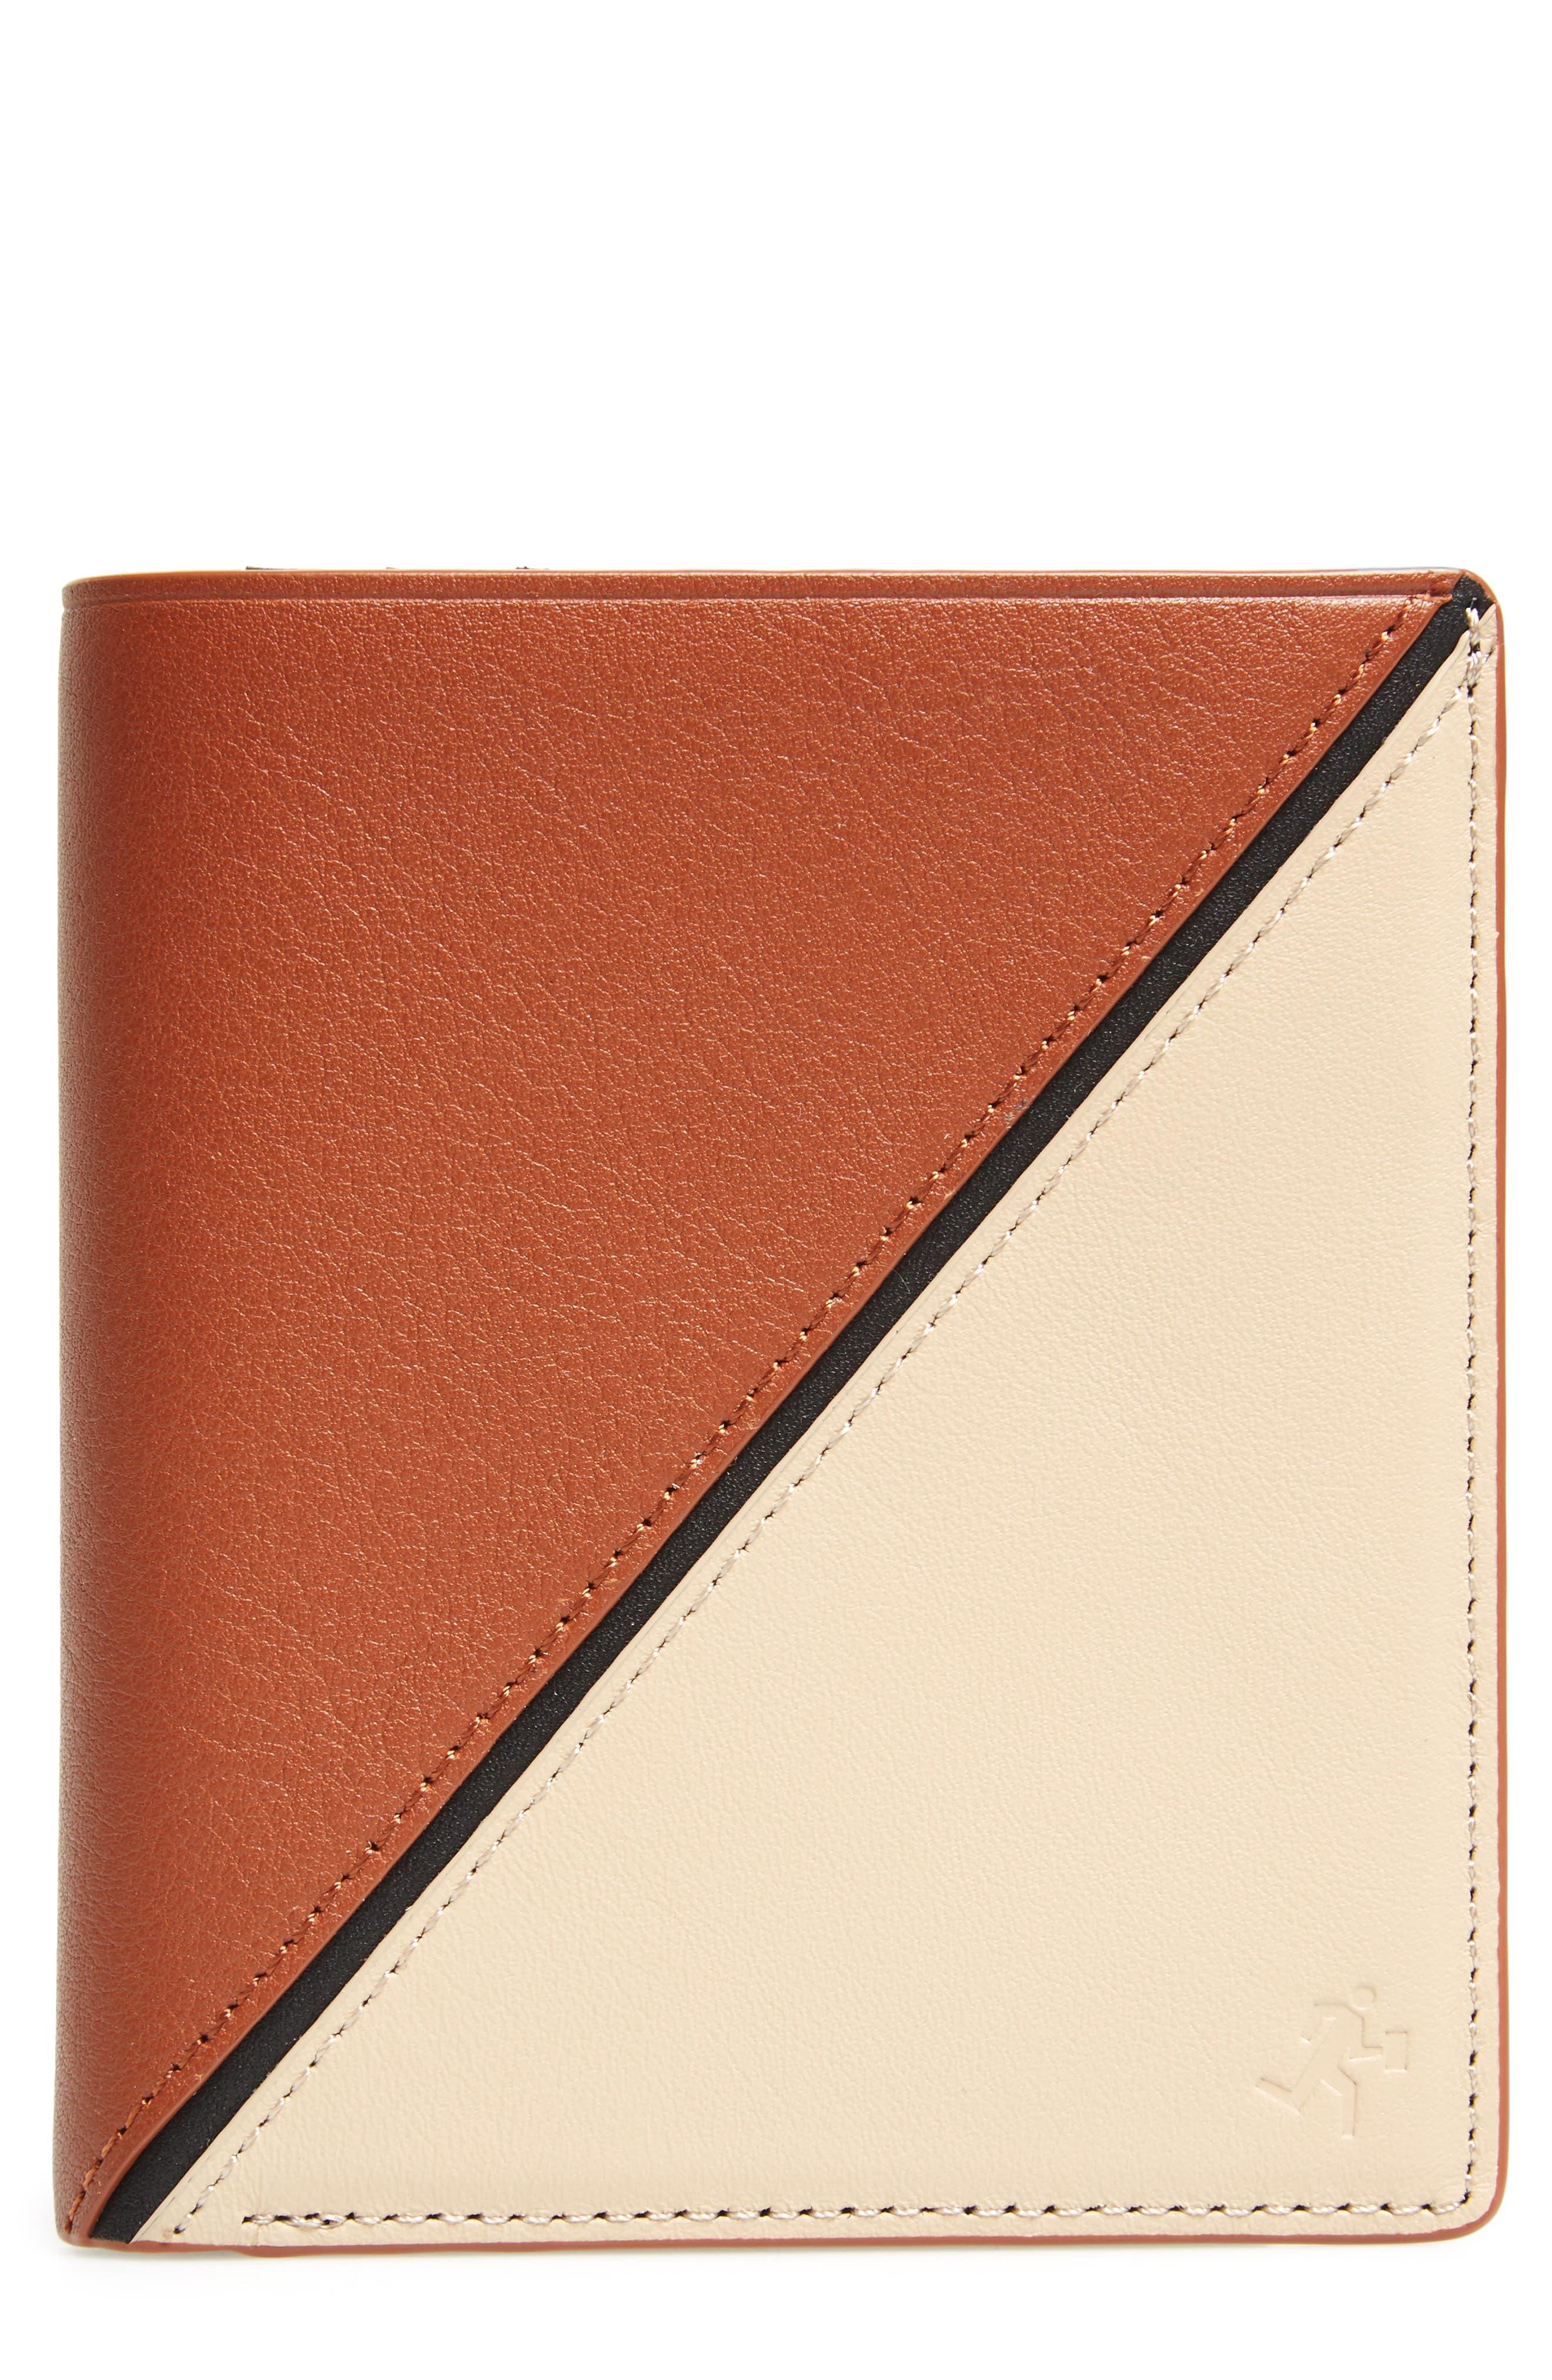 Bradley Bifold Leather Wallet,                         Main,                         color, Multi Sand